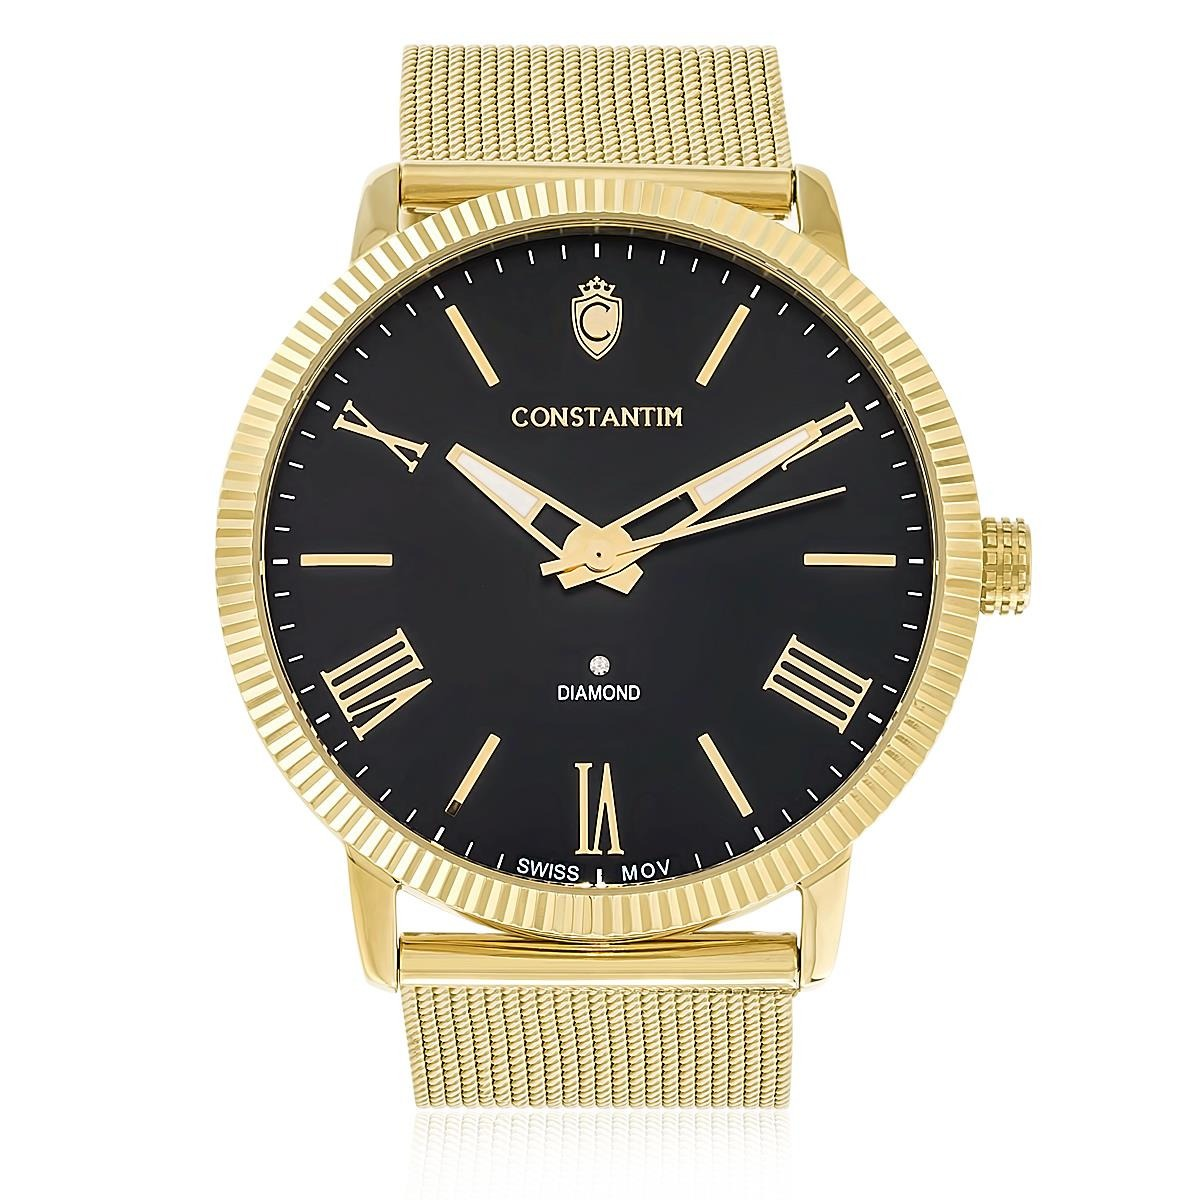 3b684806ad1 relógio constantim diamond gold black fundo preto. Carregando zoom.